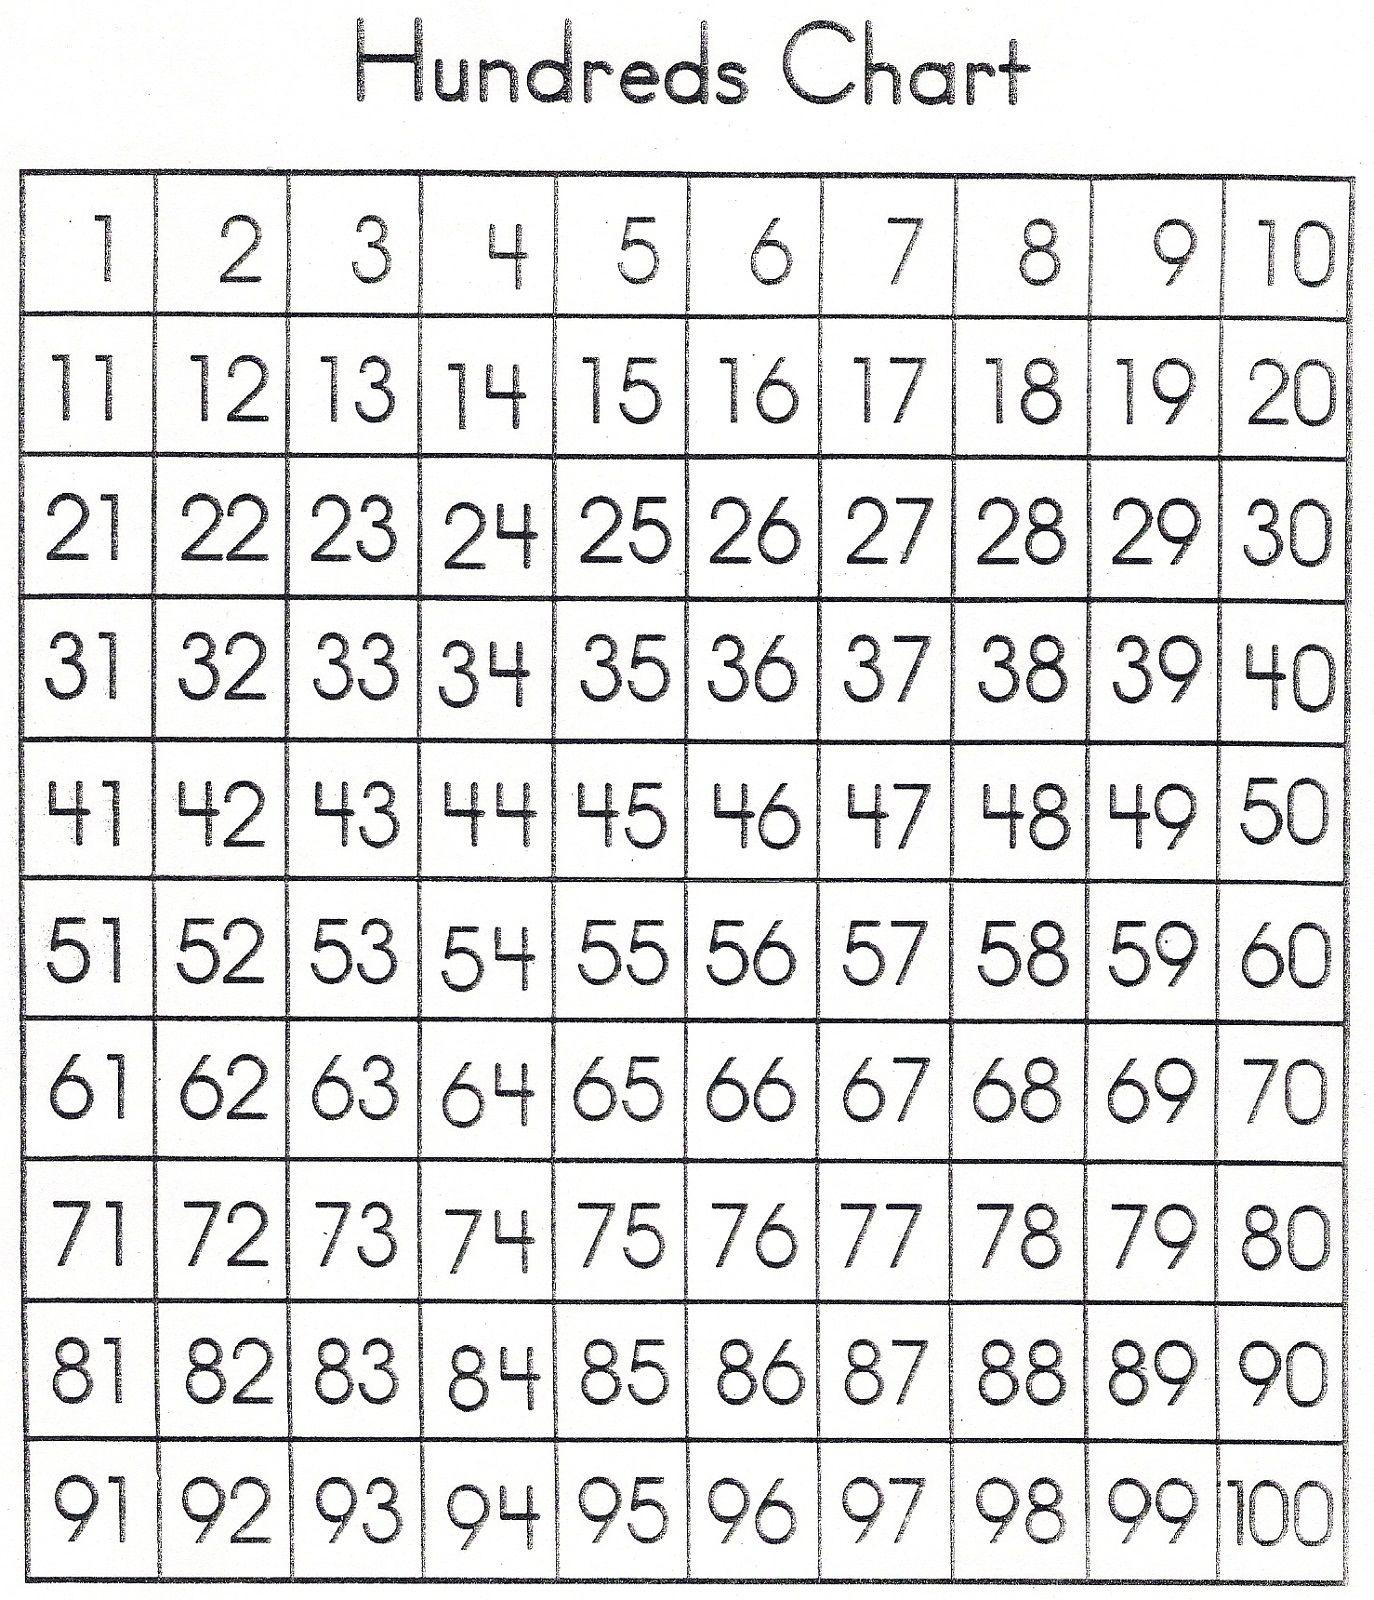 Number Sheet 1-100 To Print | Math Worksheets For Kids | Pinterest - Free Printable Number Worksheets 1 100